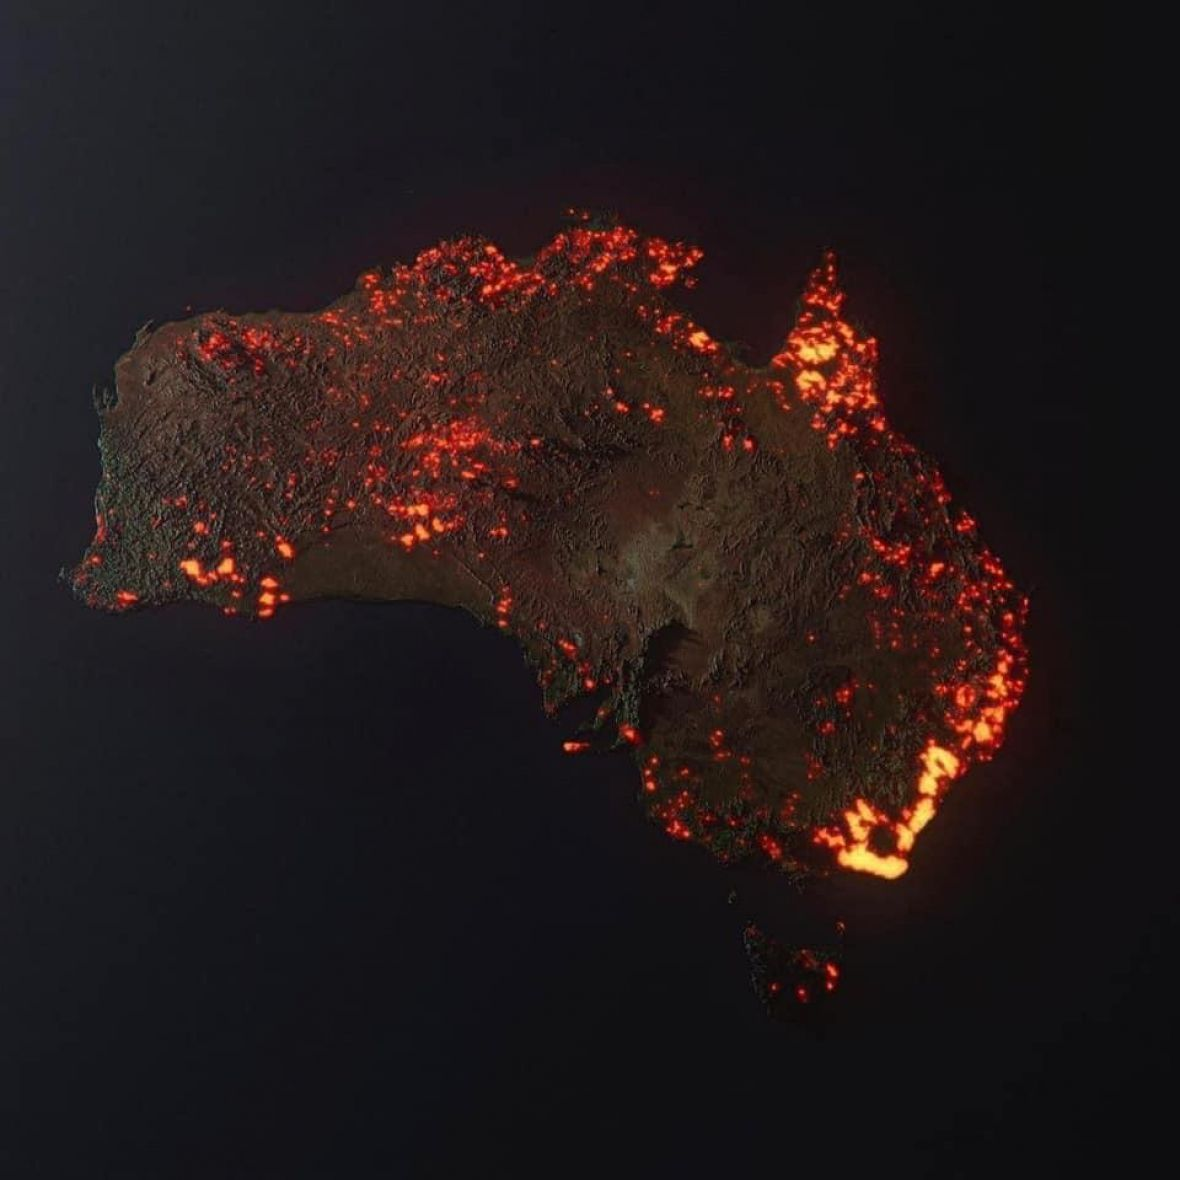 Velika ljubav stranica za upoznavanje australija